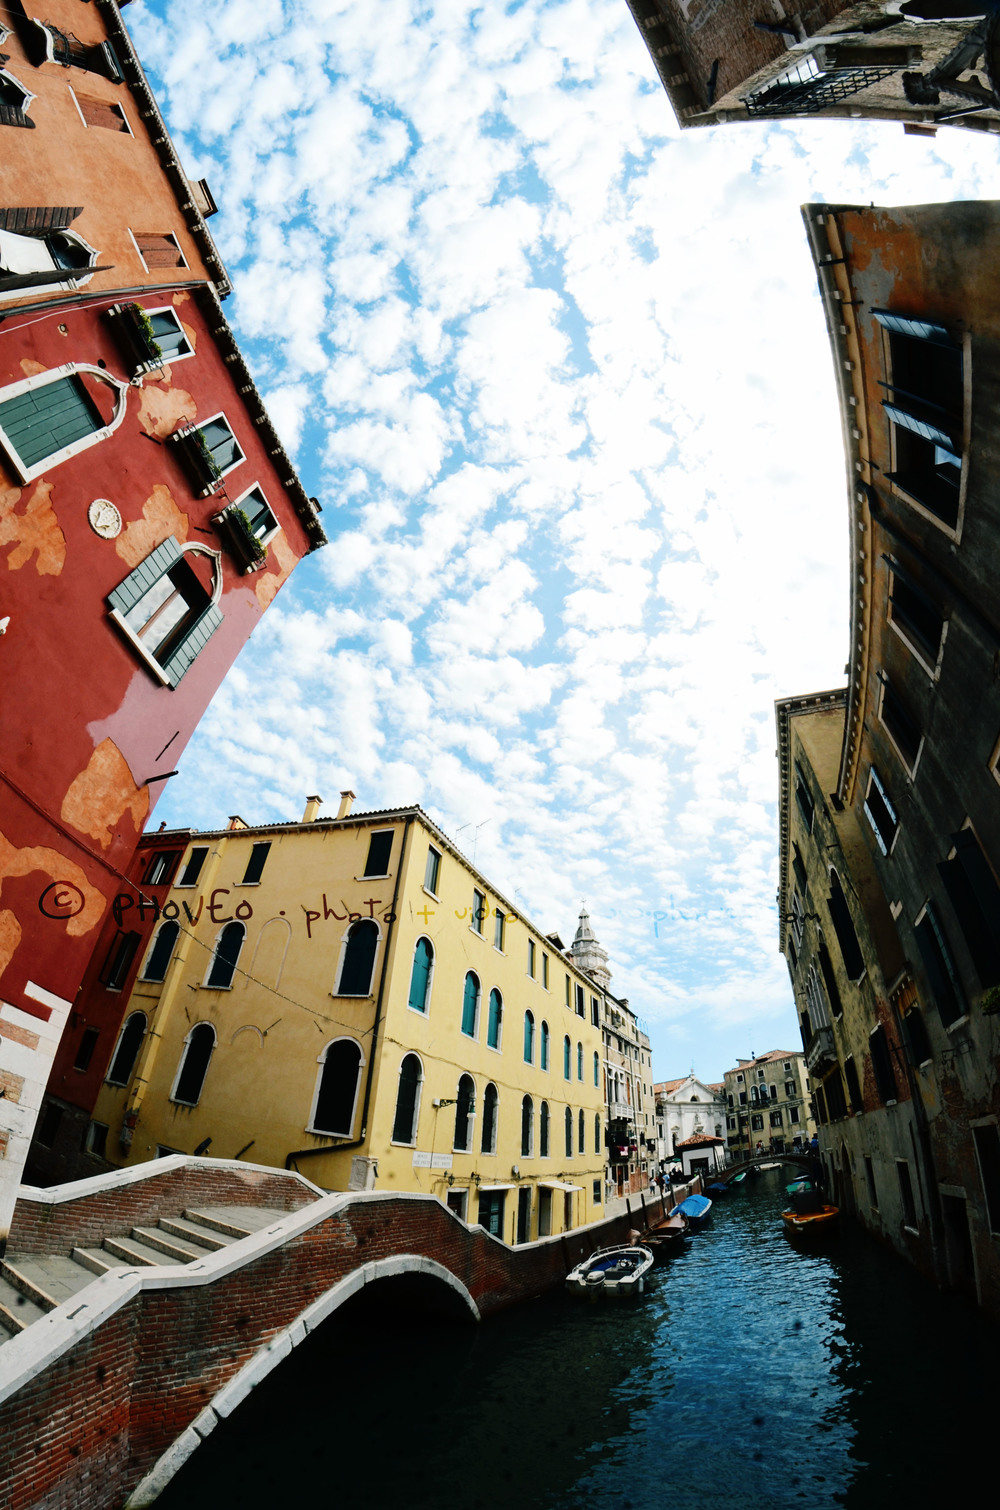 WM_Venice1.jpg